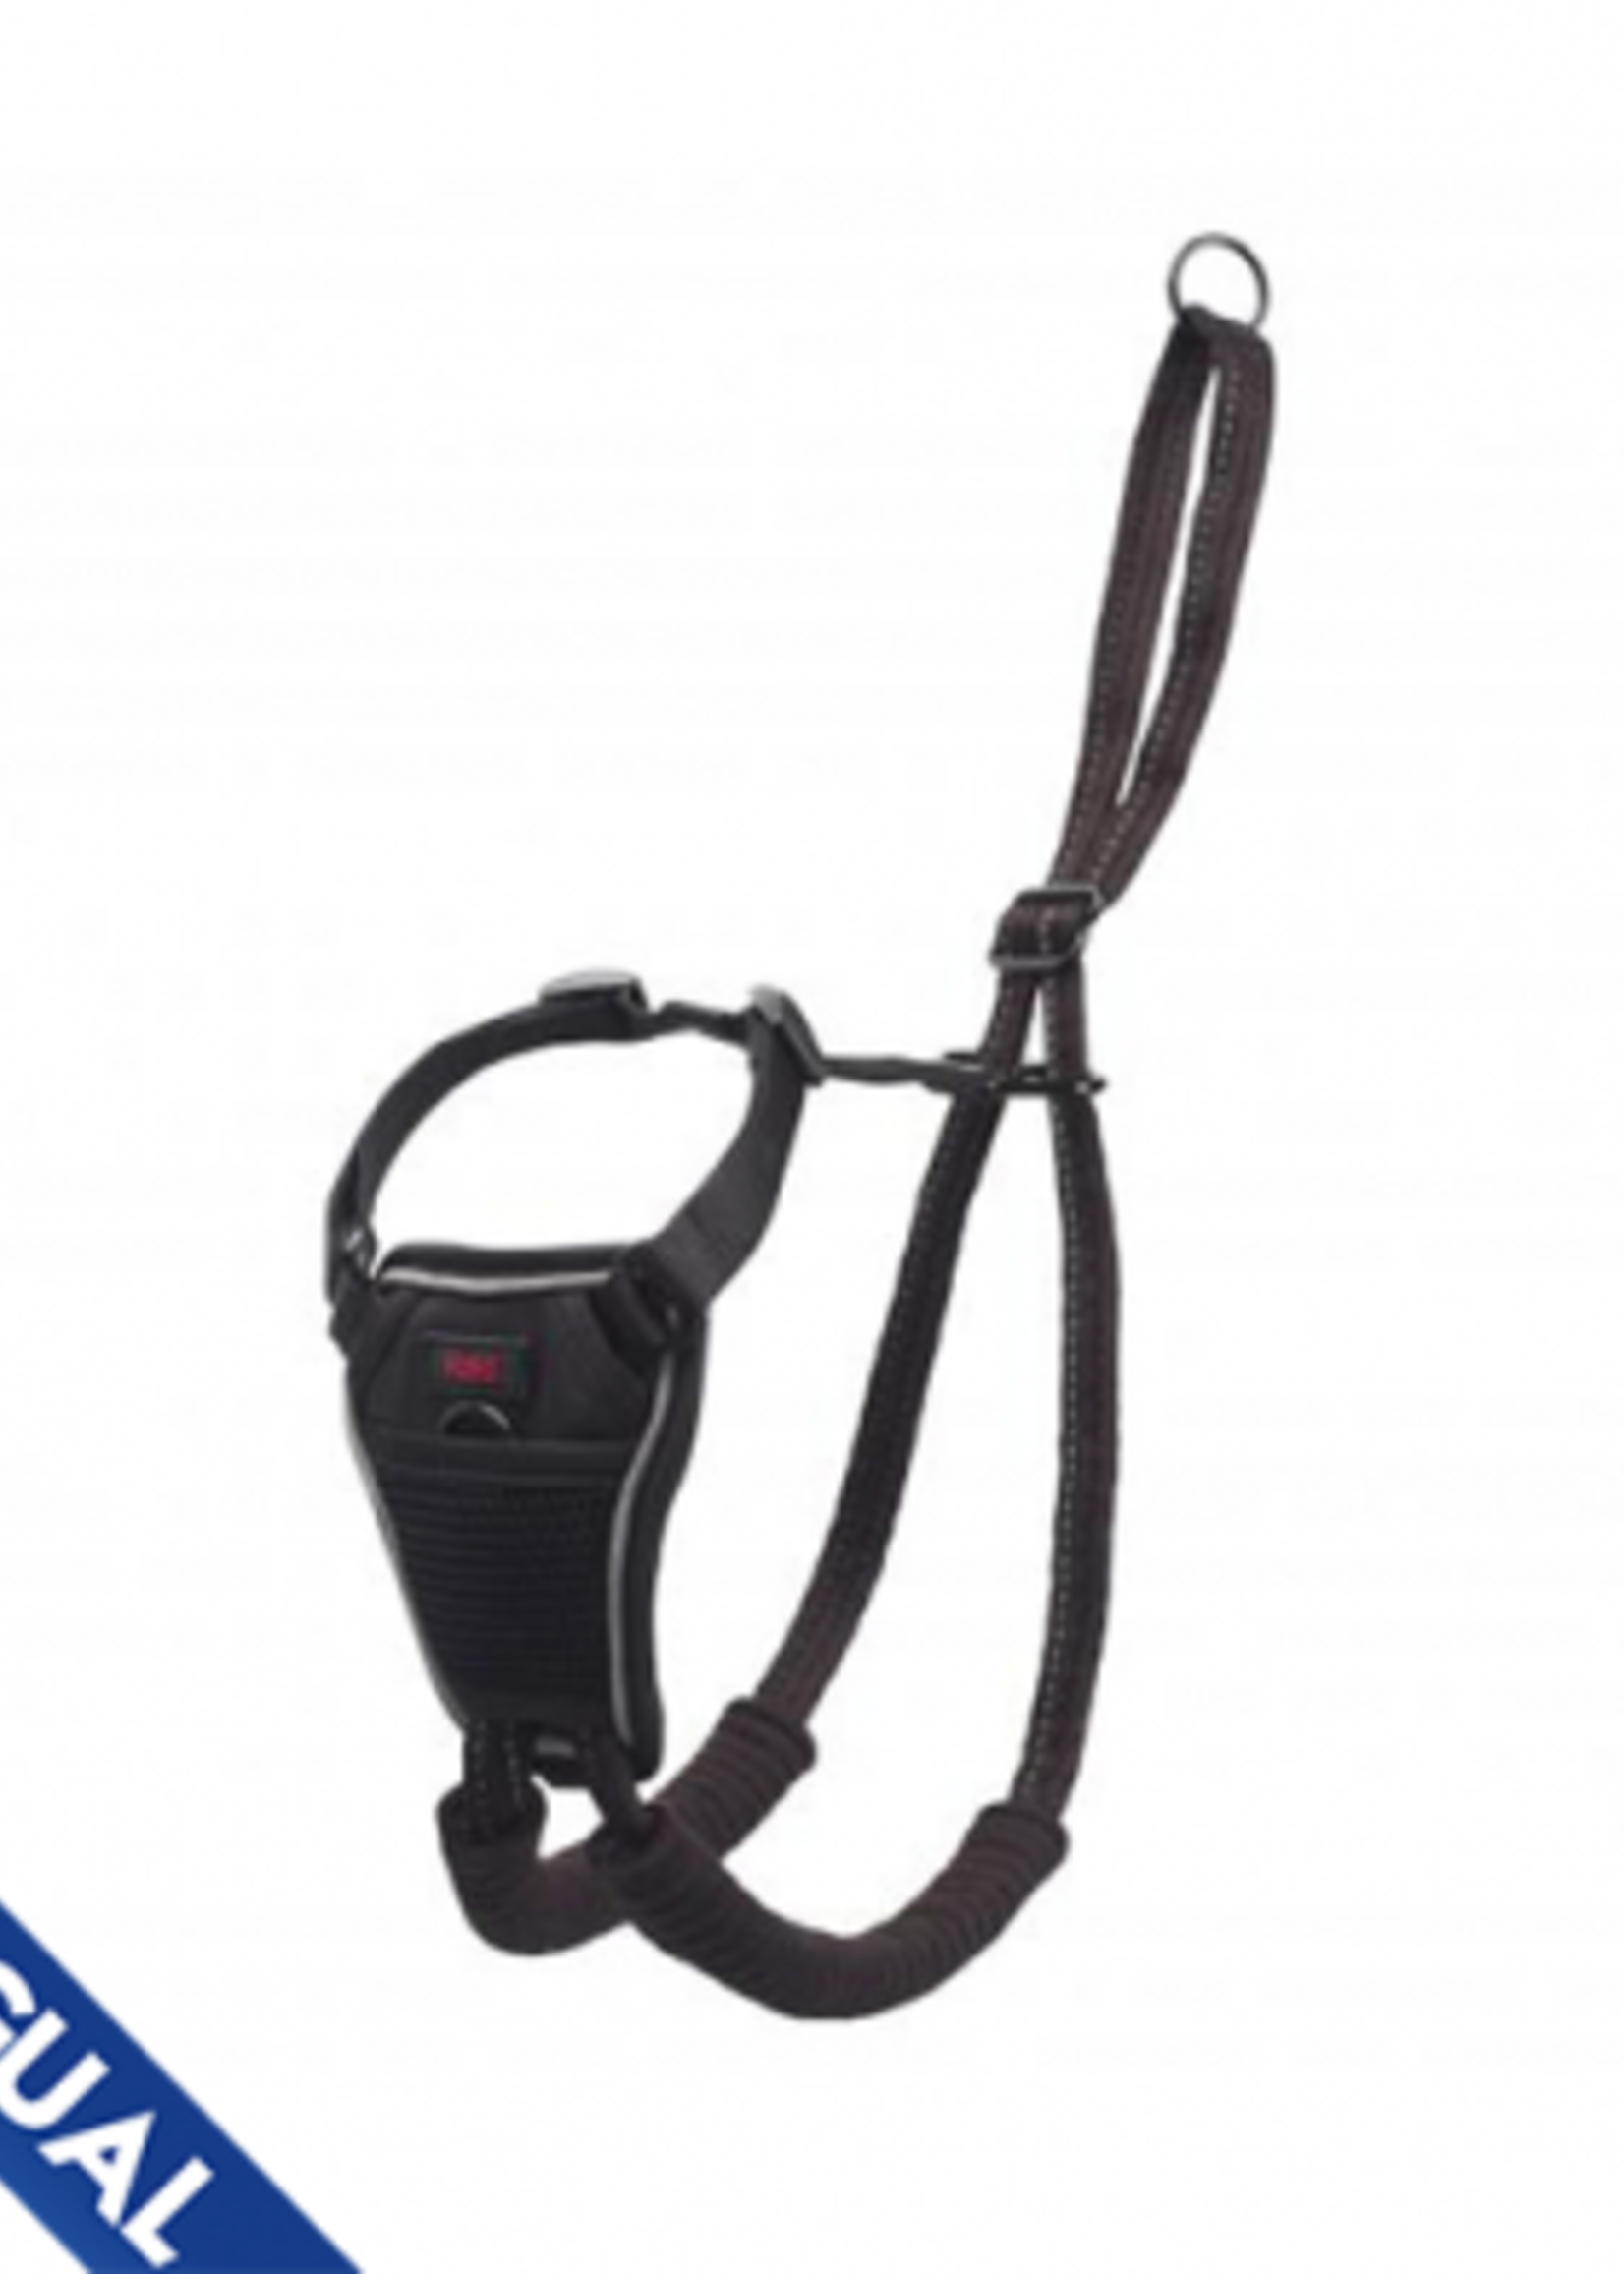 Company of Animals® Halti® No-Pull Harness Medium